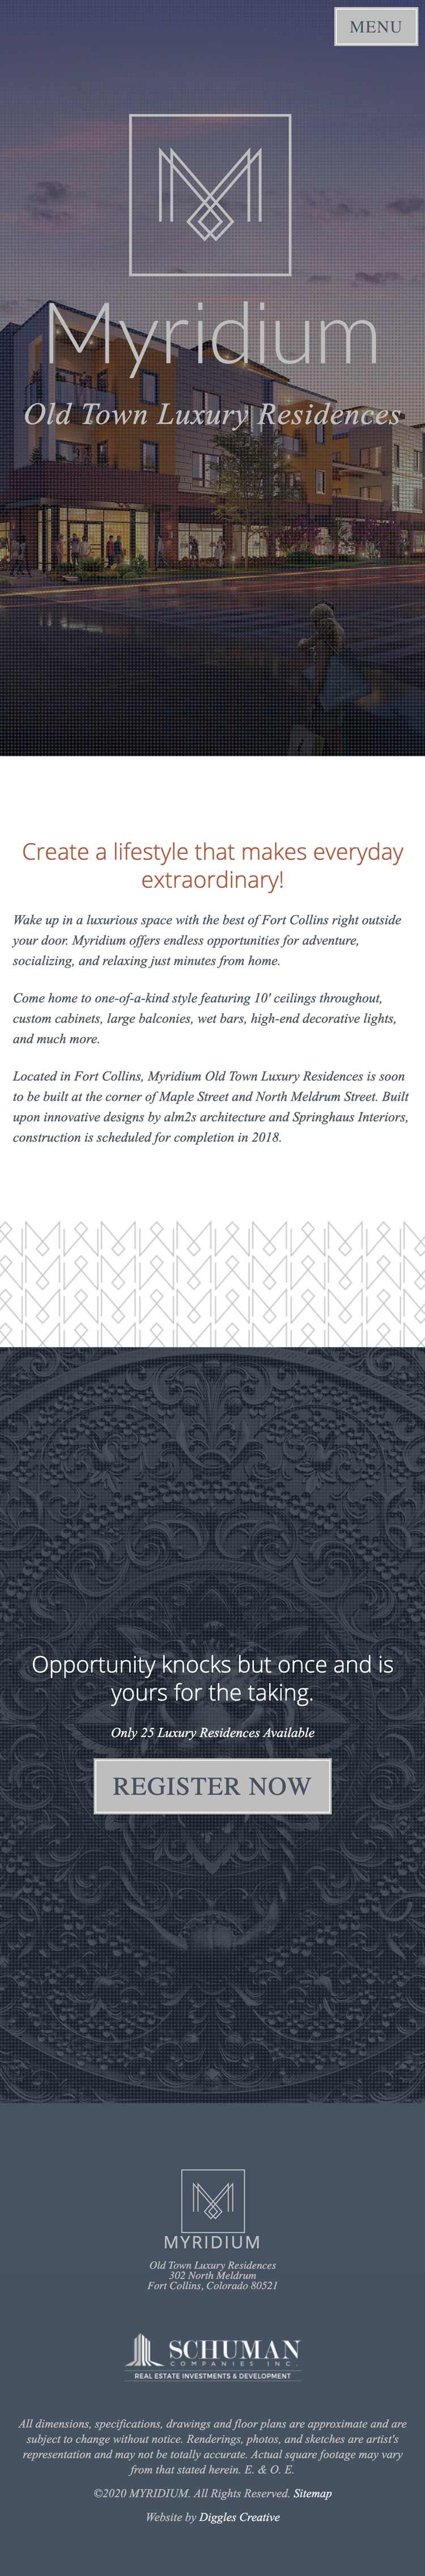 Myridium - Luxury Real Estate Website Design